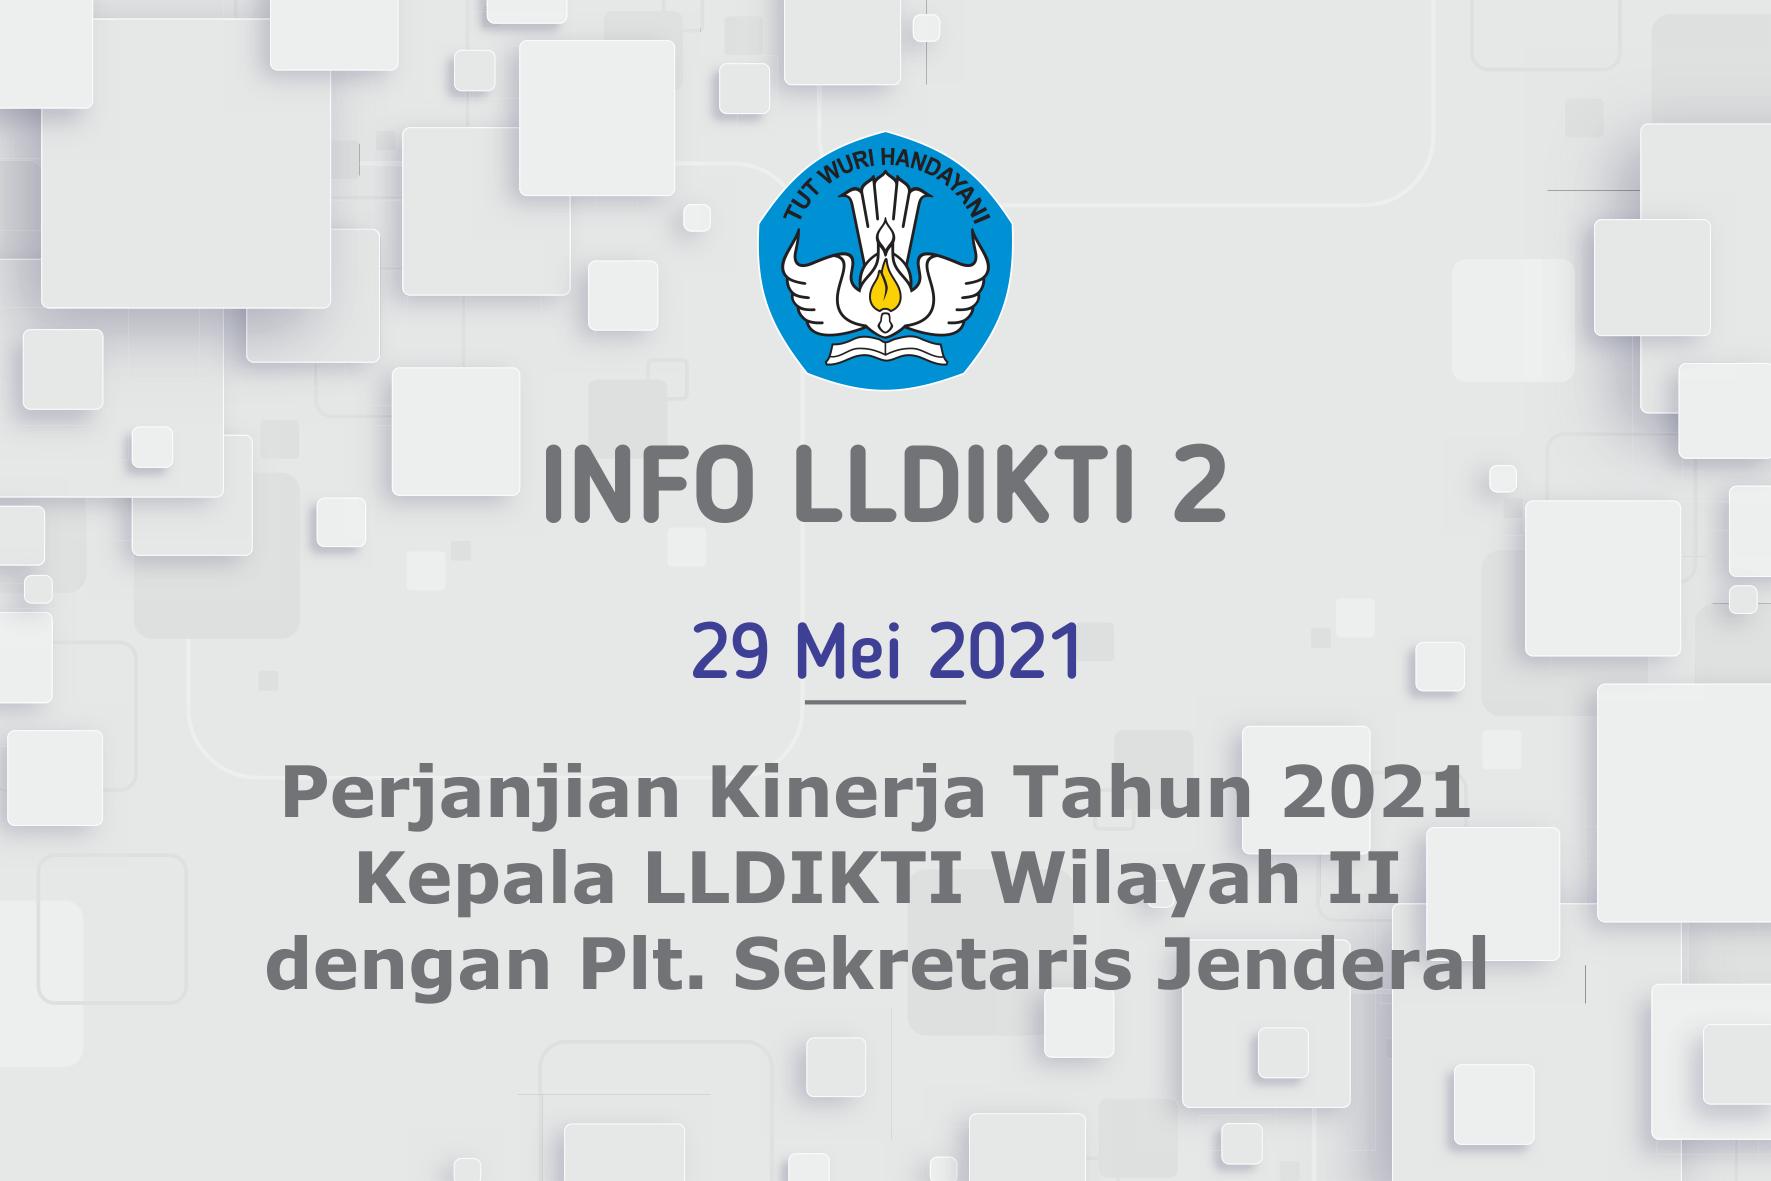 Perjanjian Kinerja Tahun 2021 Kepala LLDIKTI Wilayah II Dengan Plt. Sekretaris Jenderal